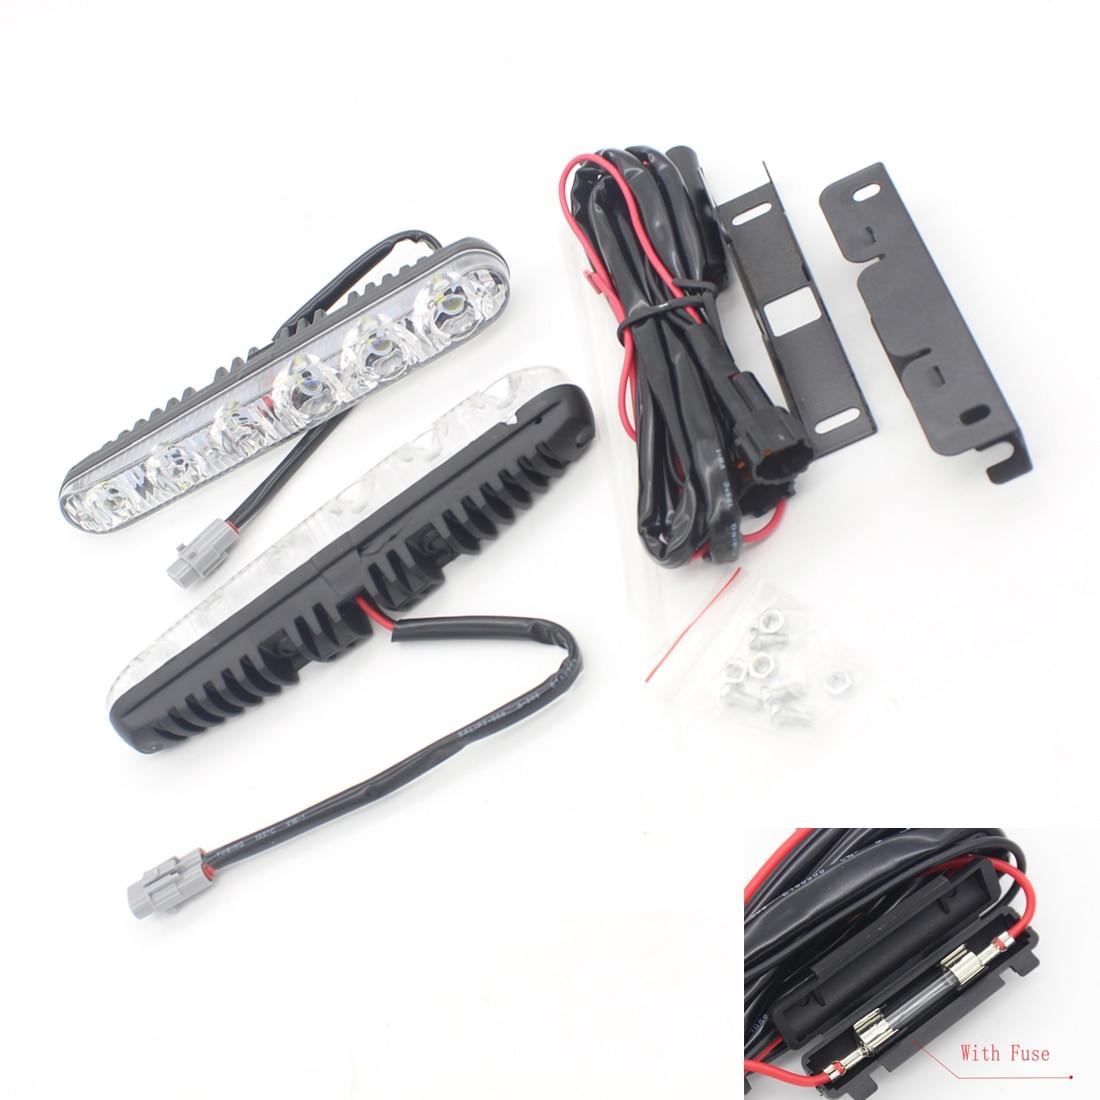 Dongzhen Car High Power And Low Beam LED DRL For Hyundai Tucson Elantra Sonata Ix25 Ix35 Ix45 Santafe Accent Verna